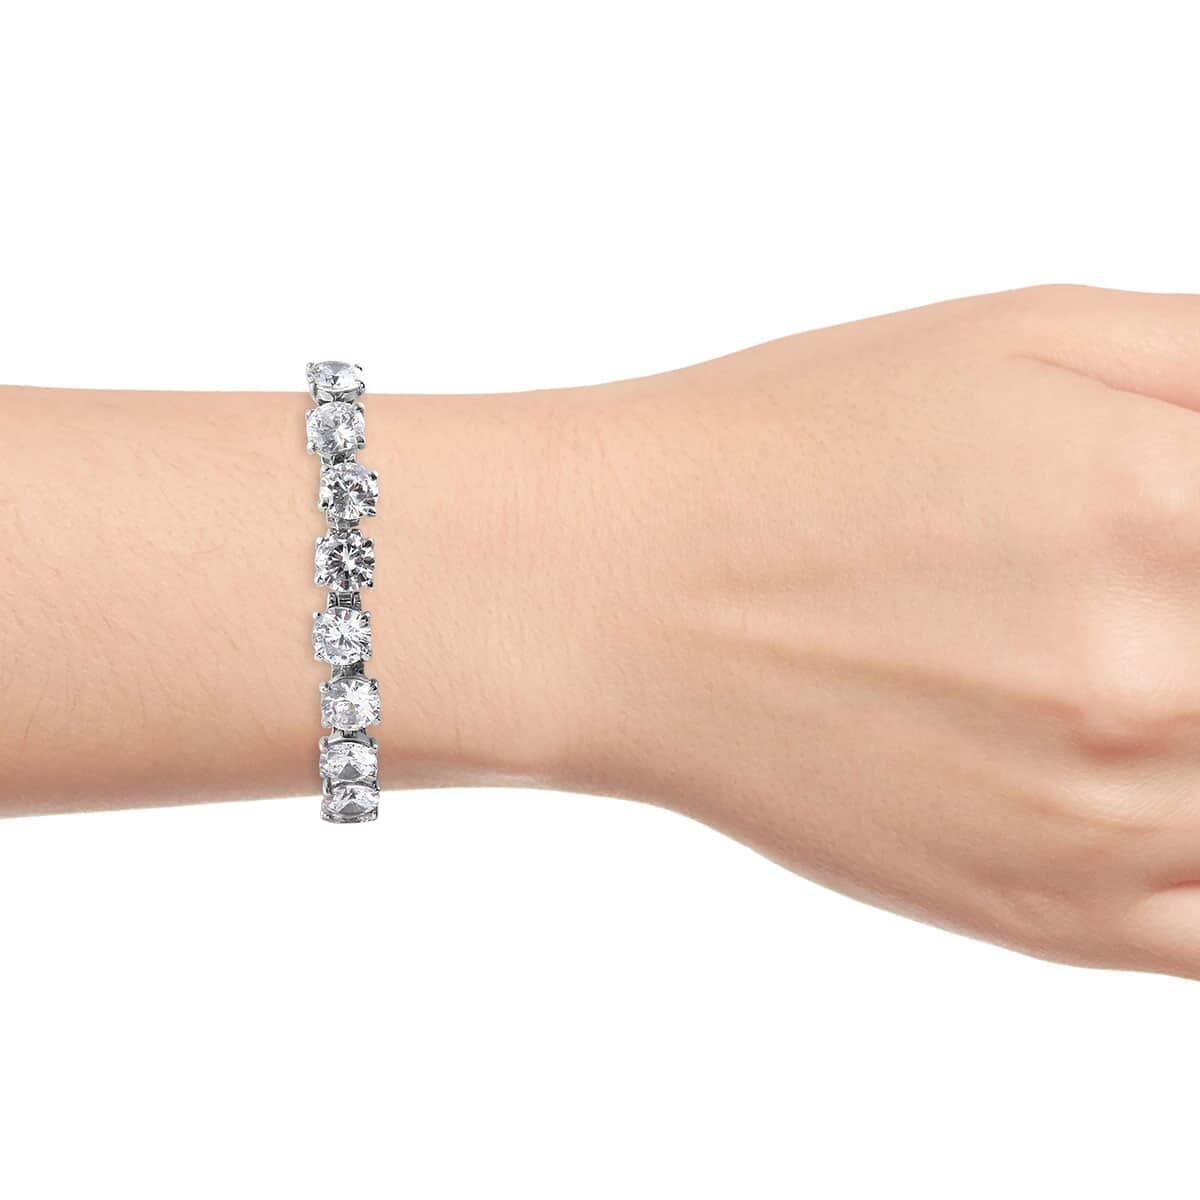 Steel-Cubic-Zirconia-CZ-Orange-Elegant-Adjustable-Bolo-Bracelet-for-Women-Ct-21 thumbnail 31